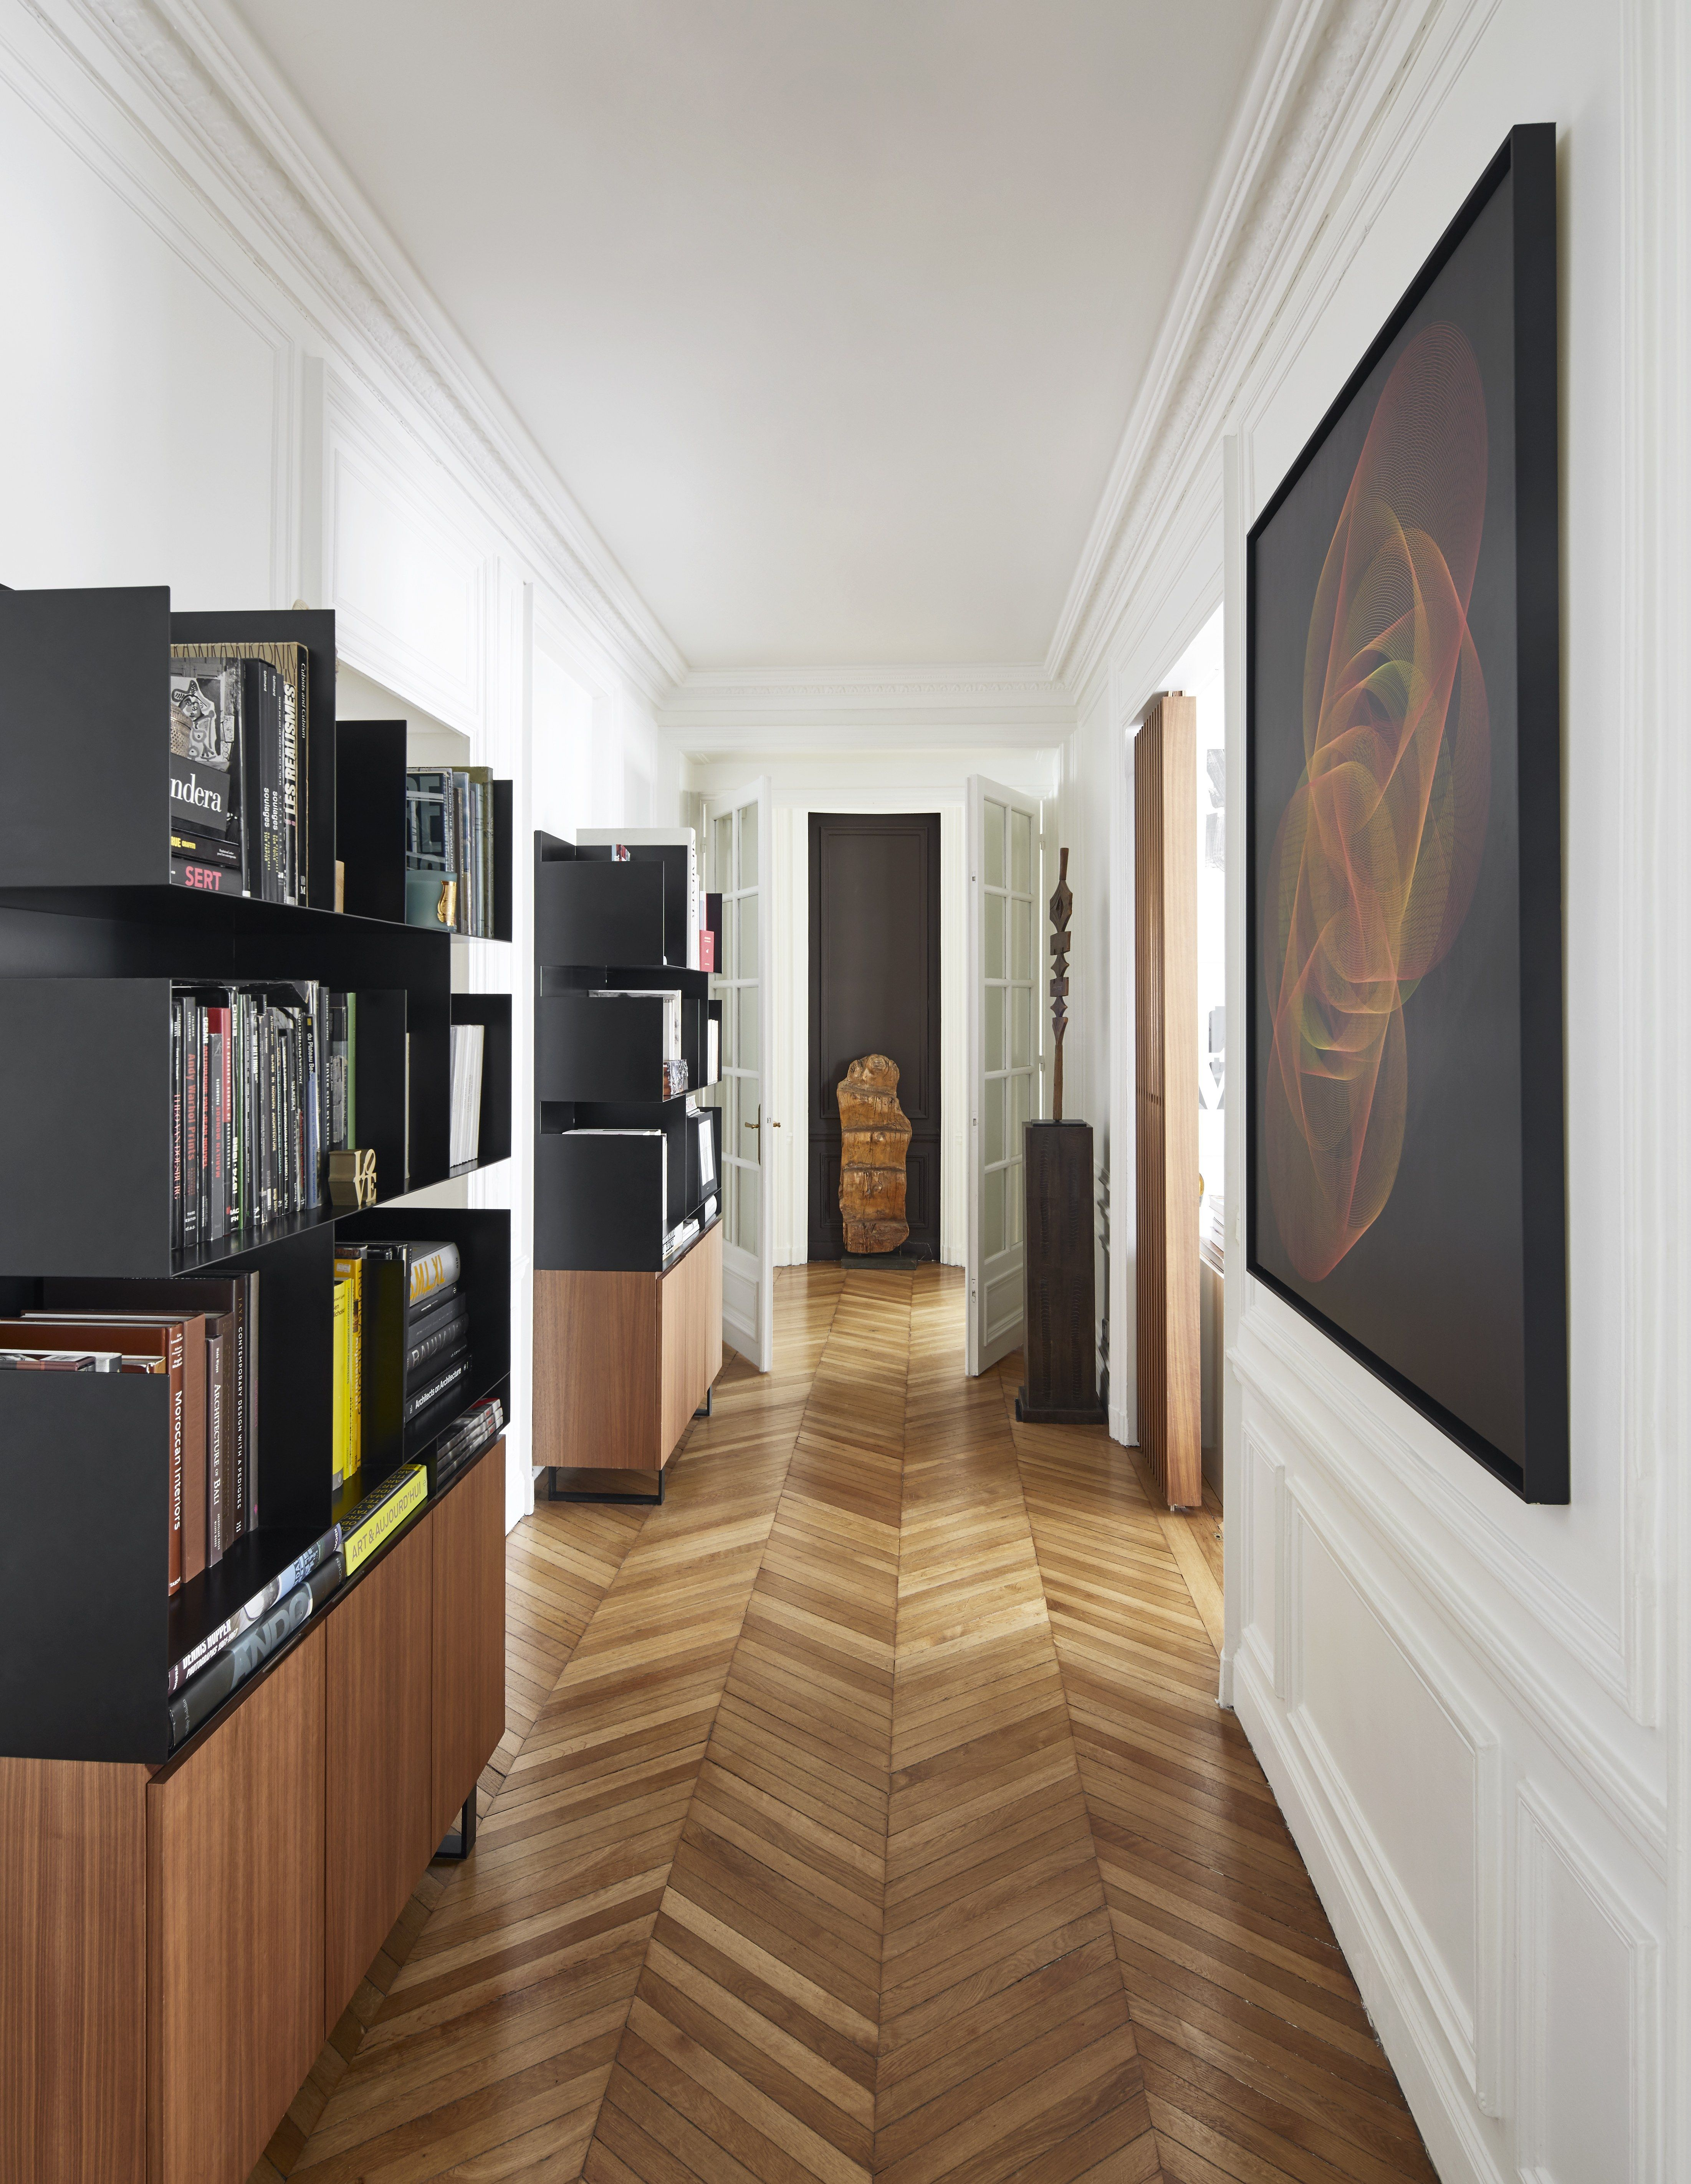 Salon-spiegel-designs tour a paris home where impactful art and innovative design create